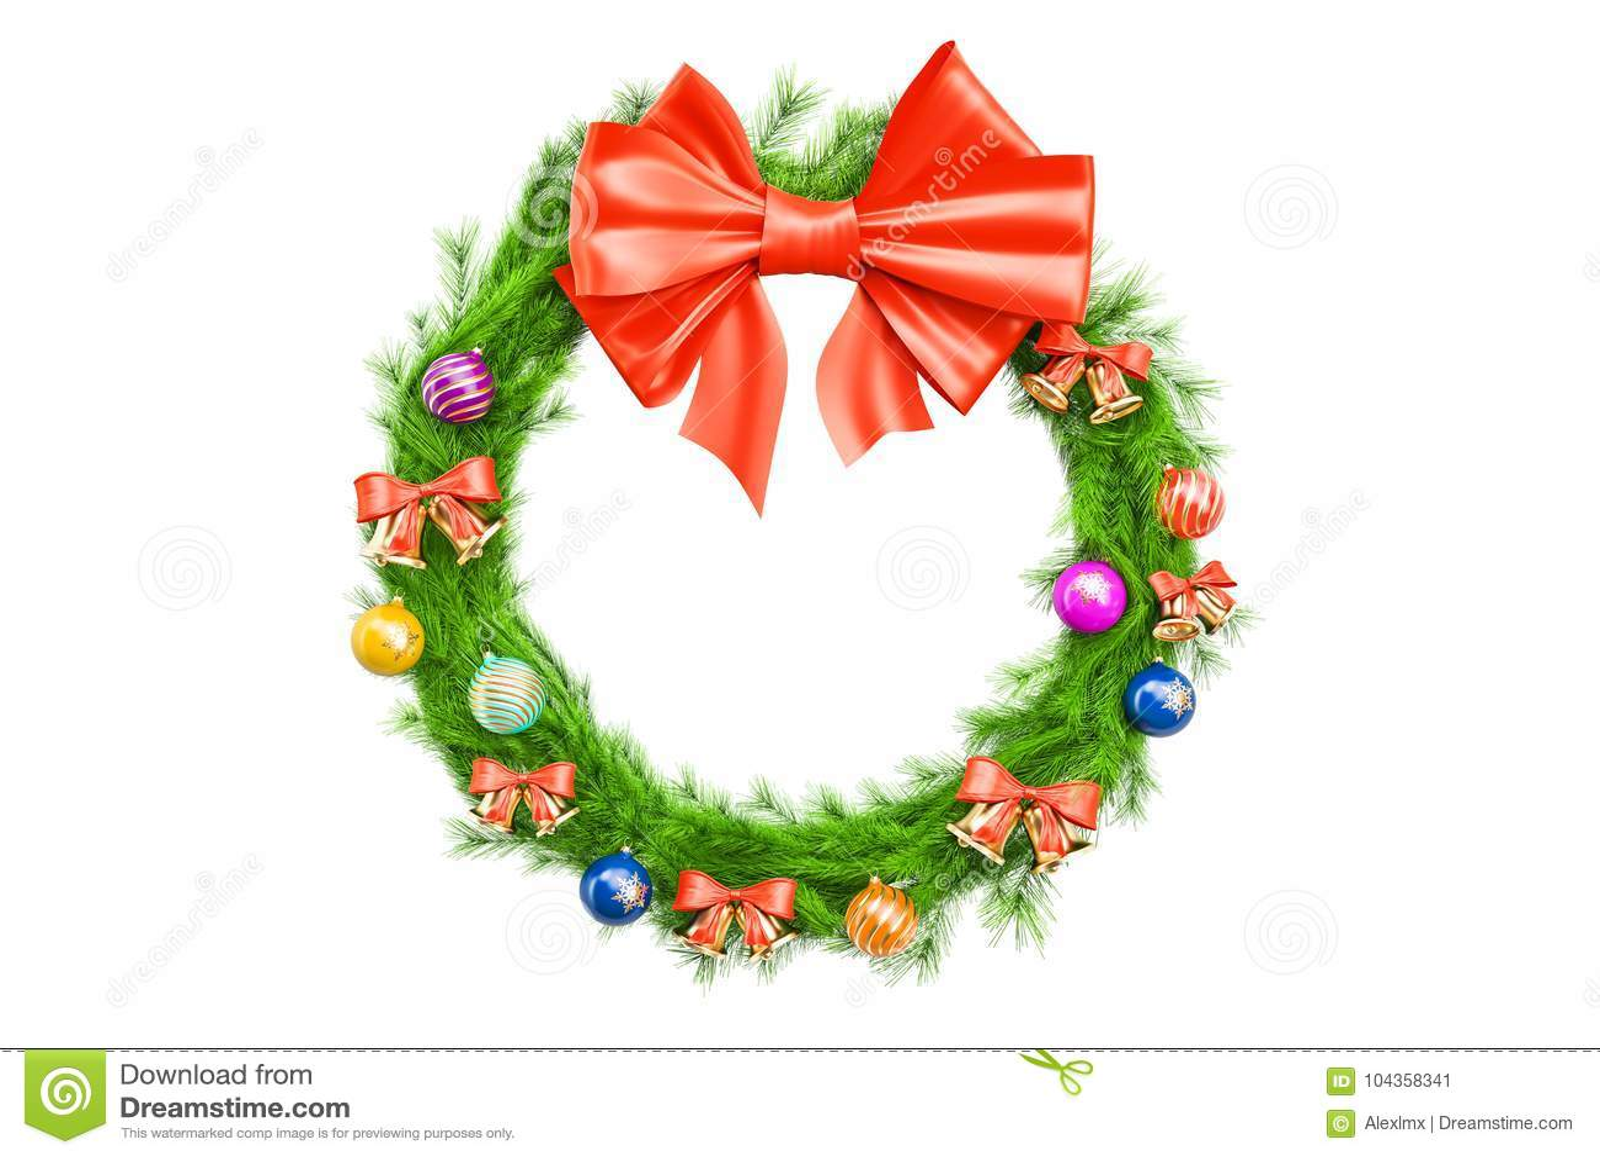 Christmas Holiday Wreath 3d Rendering Stock Illustration Illustration Of Single Closeup 104358341